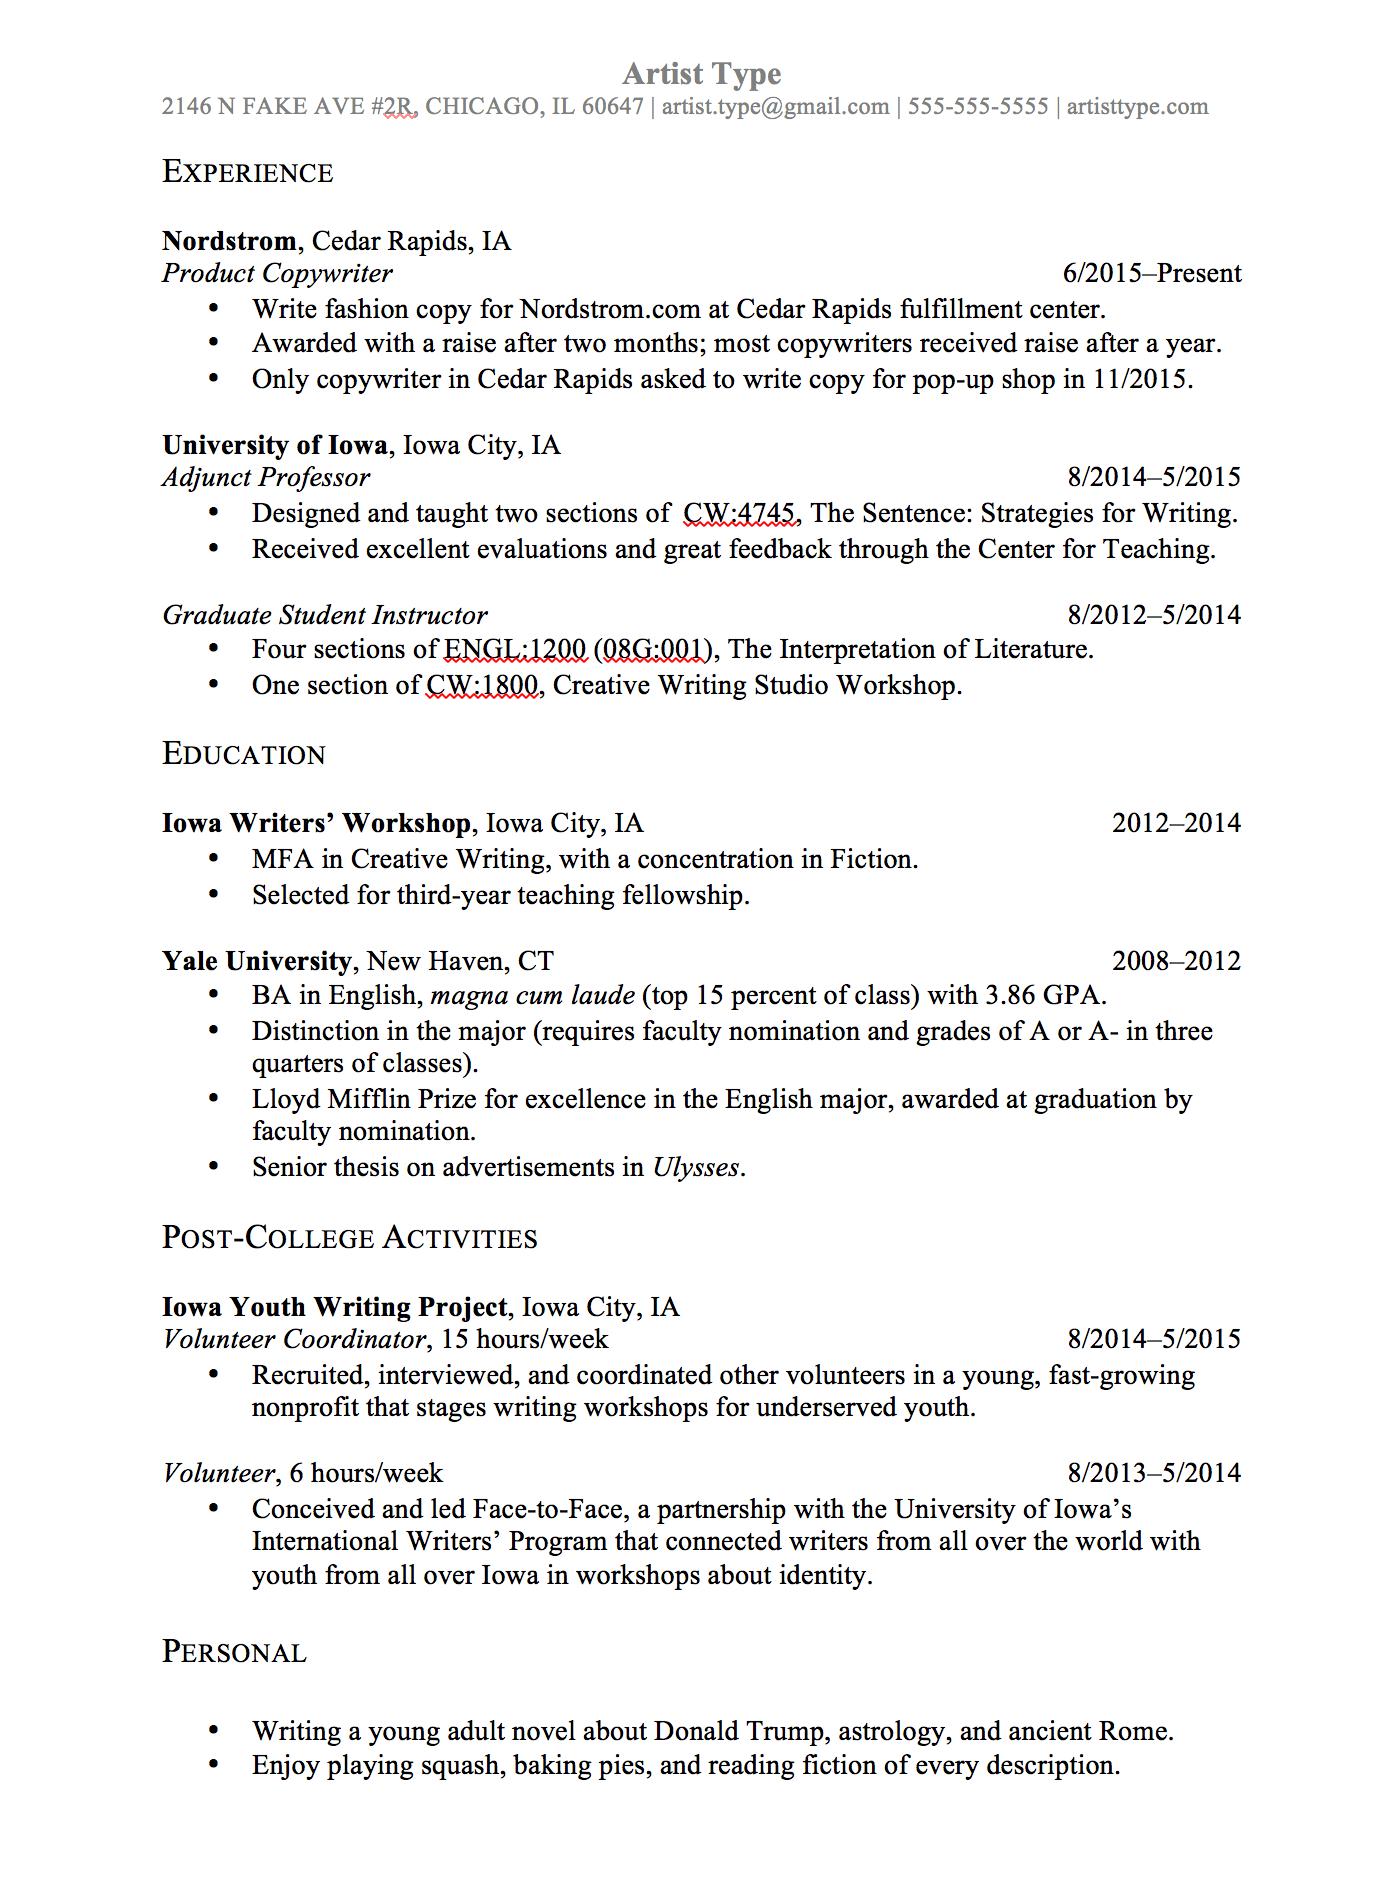 resume application for job